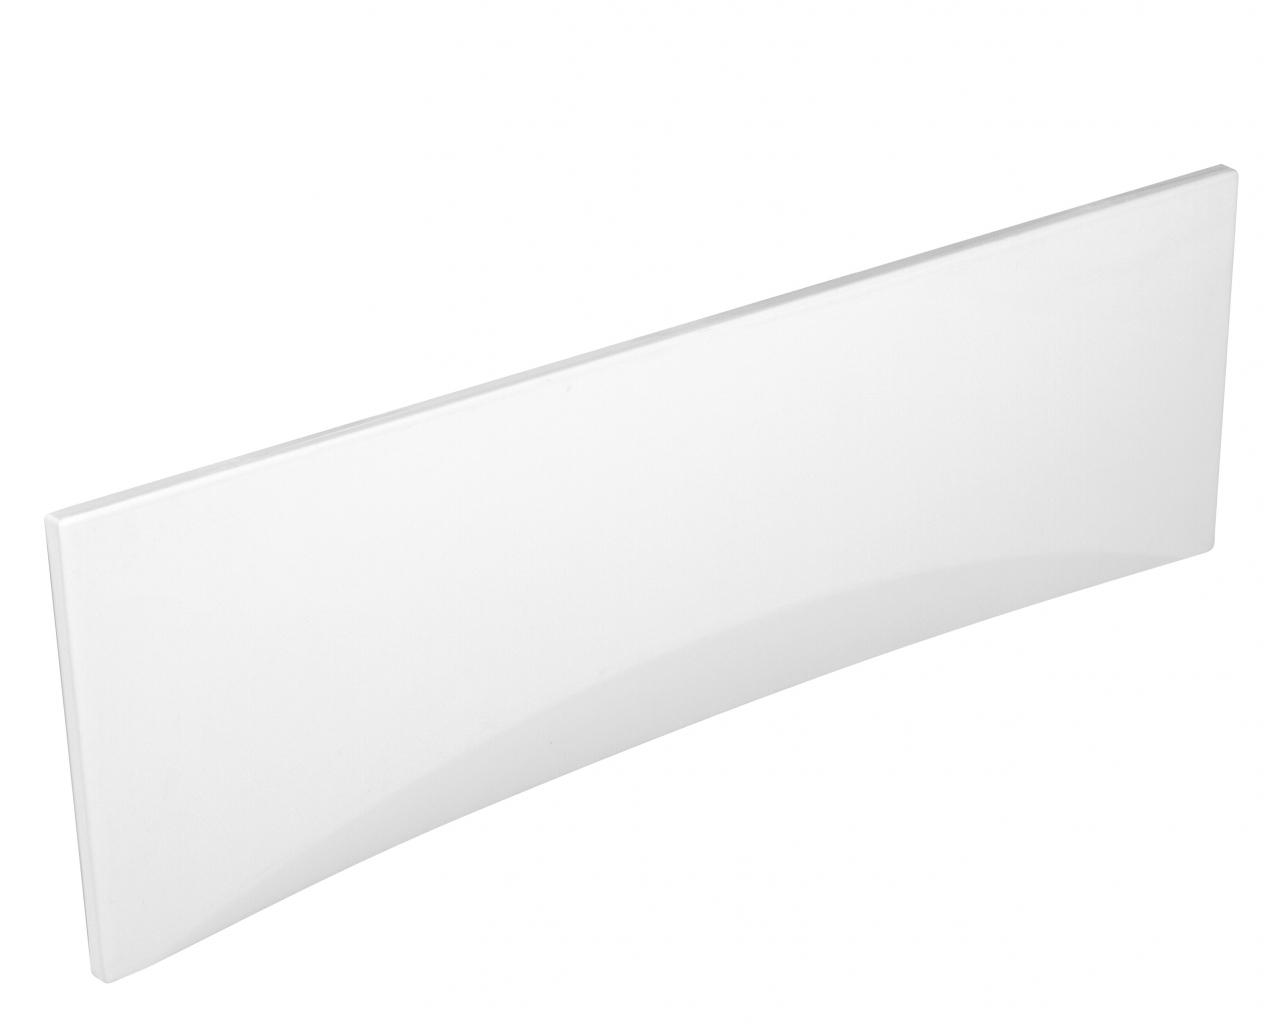 CERSANIT - PREDNÝ PANEL K VANI VIRGO/ INTRO/ ZEN 170 cm (S401-046)